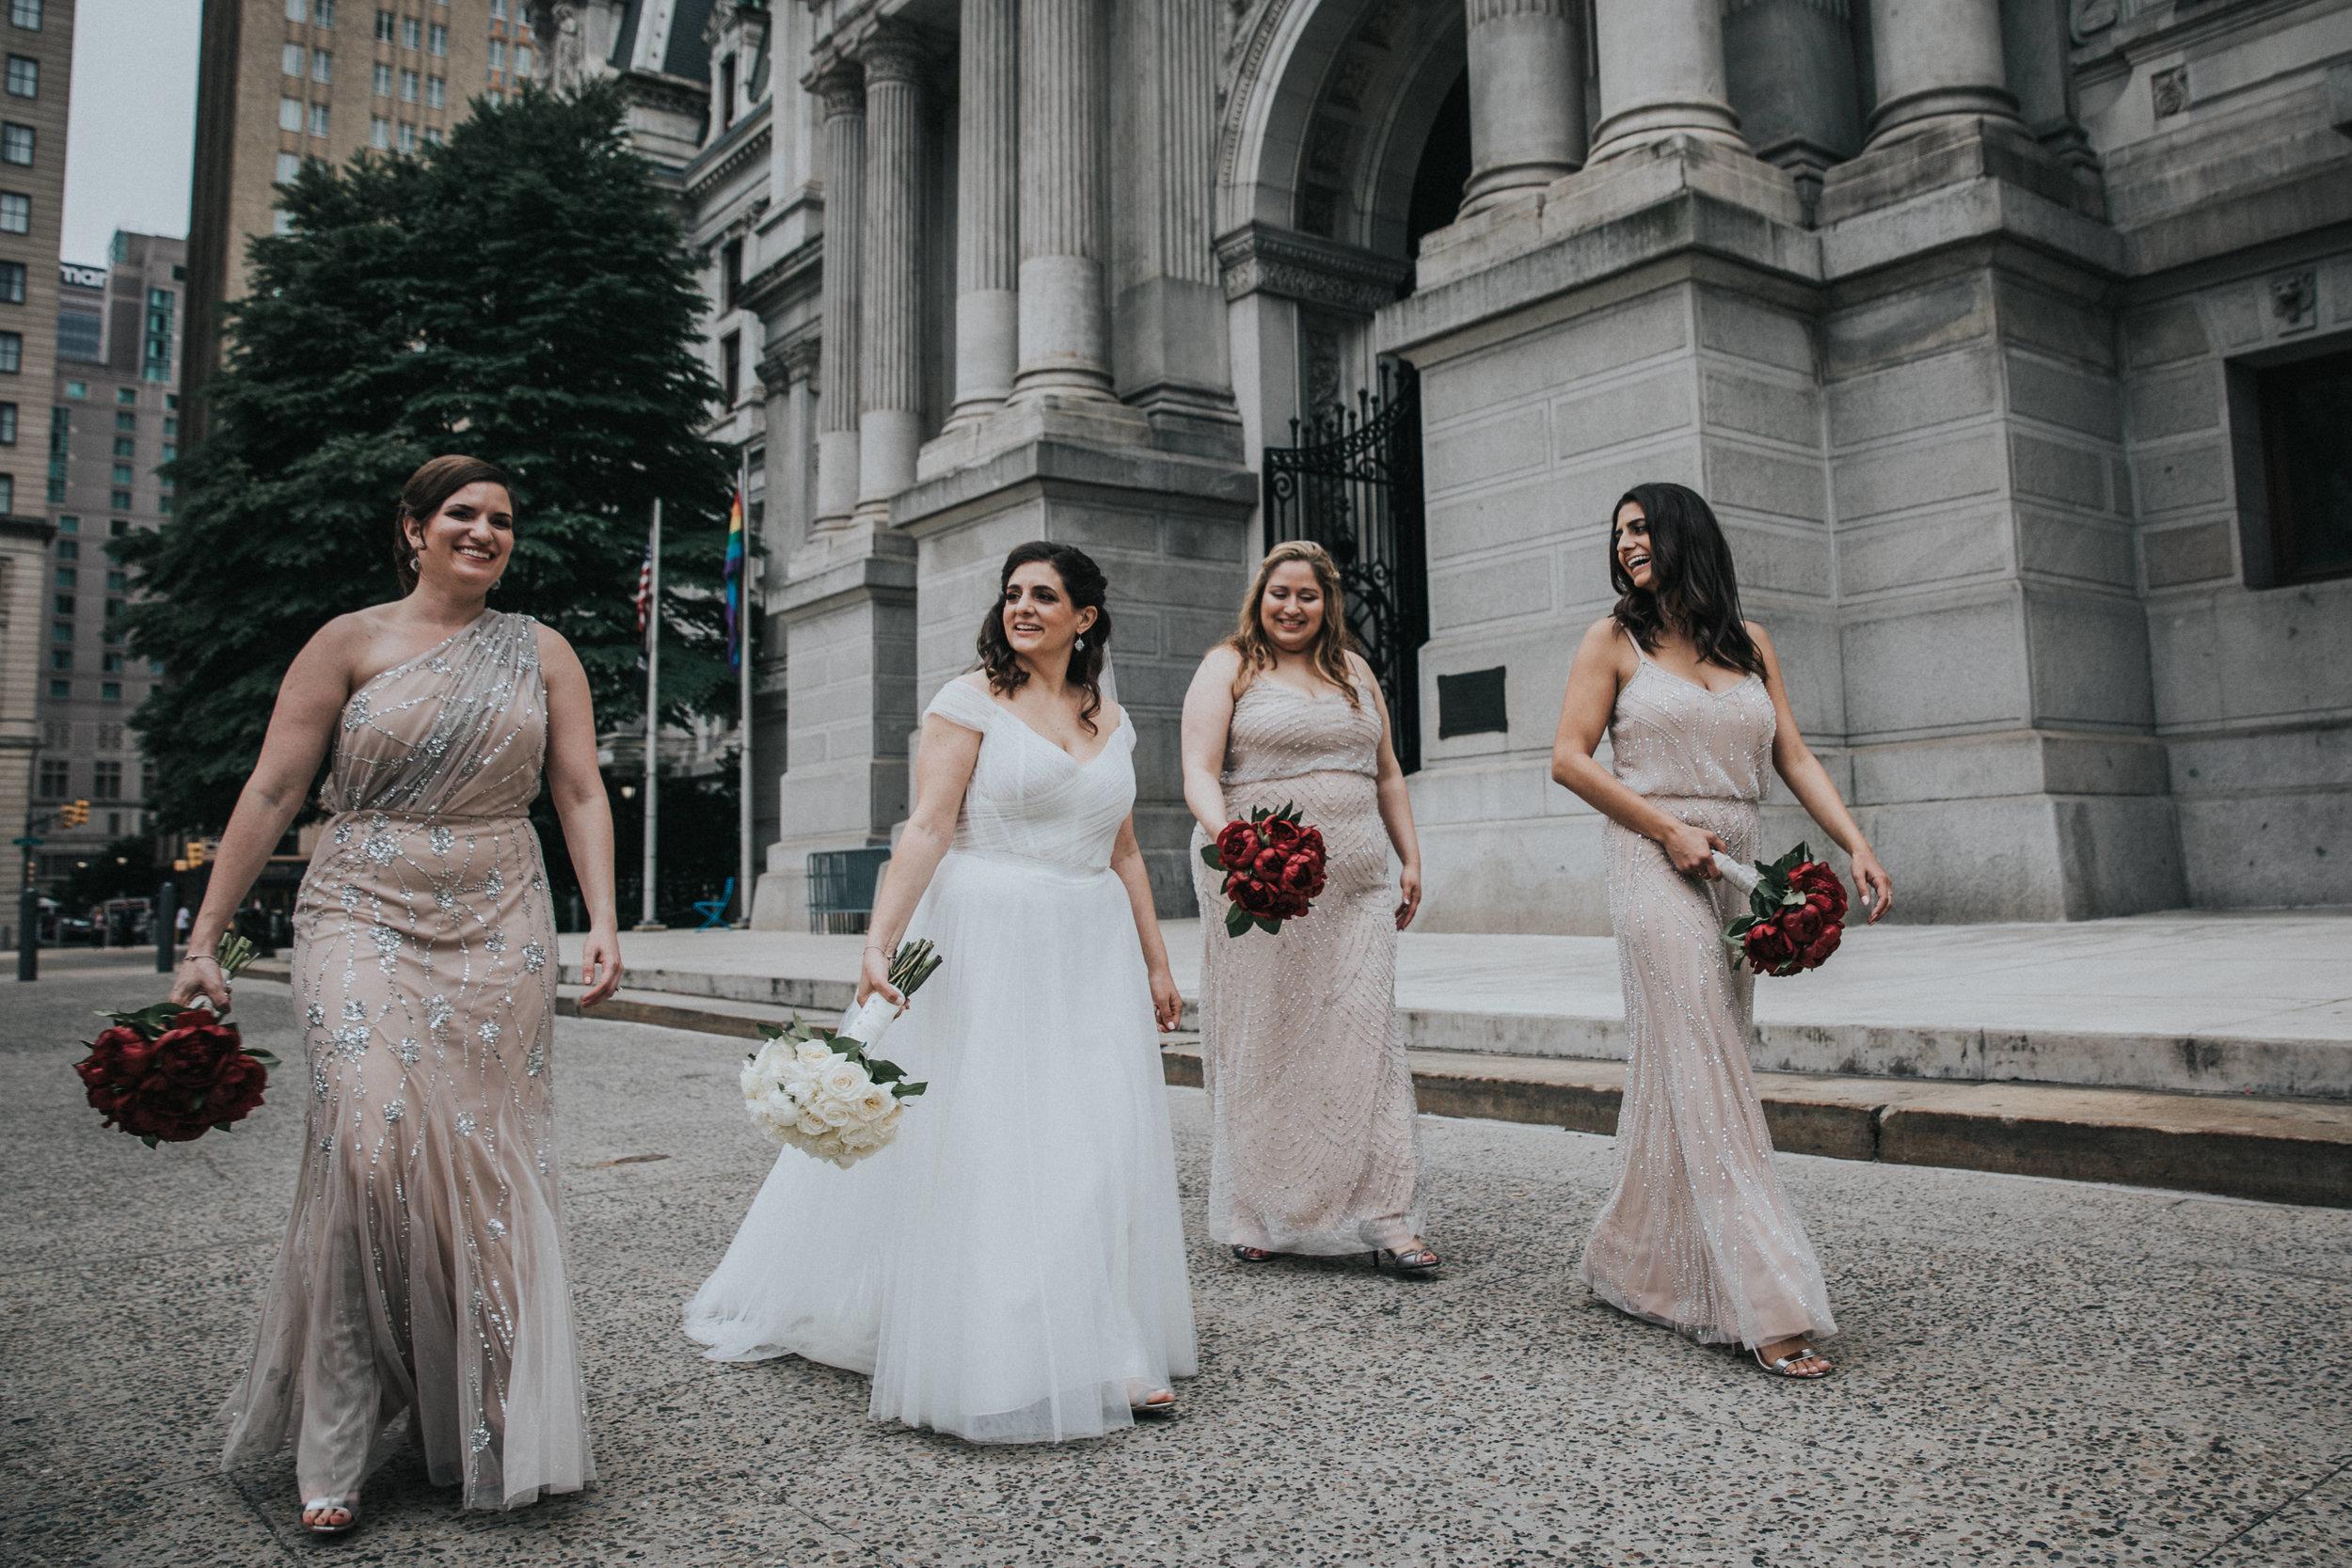 JennaLynnPhotography-NJWeddingPhotographer-Philadelphia-Wedding-ArtsBallroom-BridalParty-20.jpg